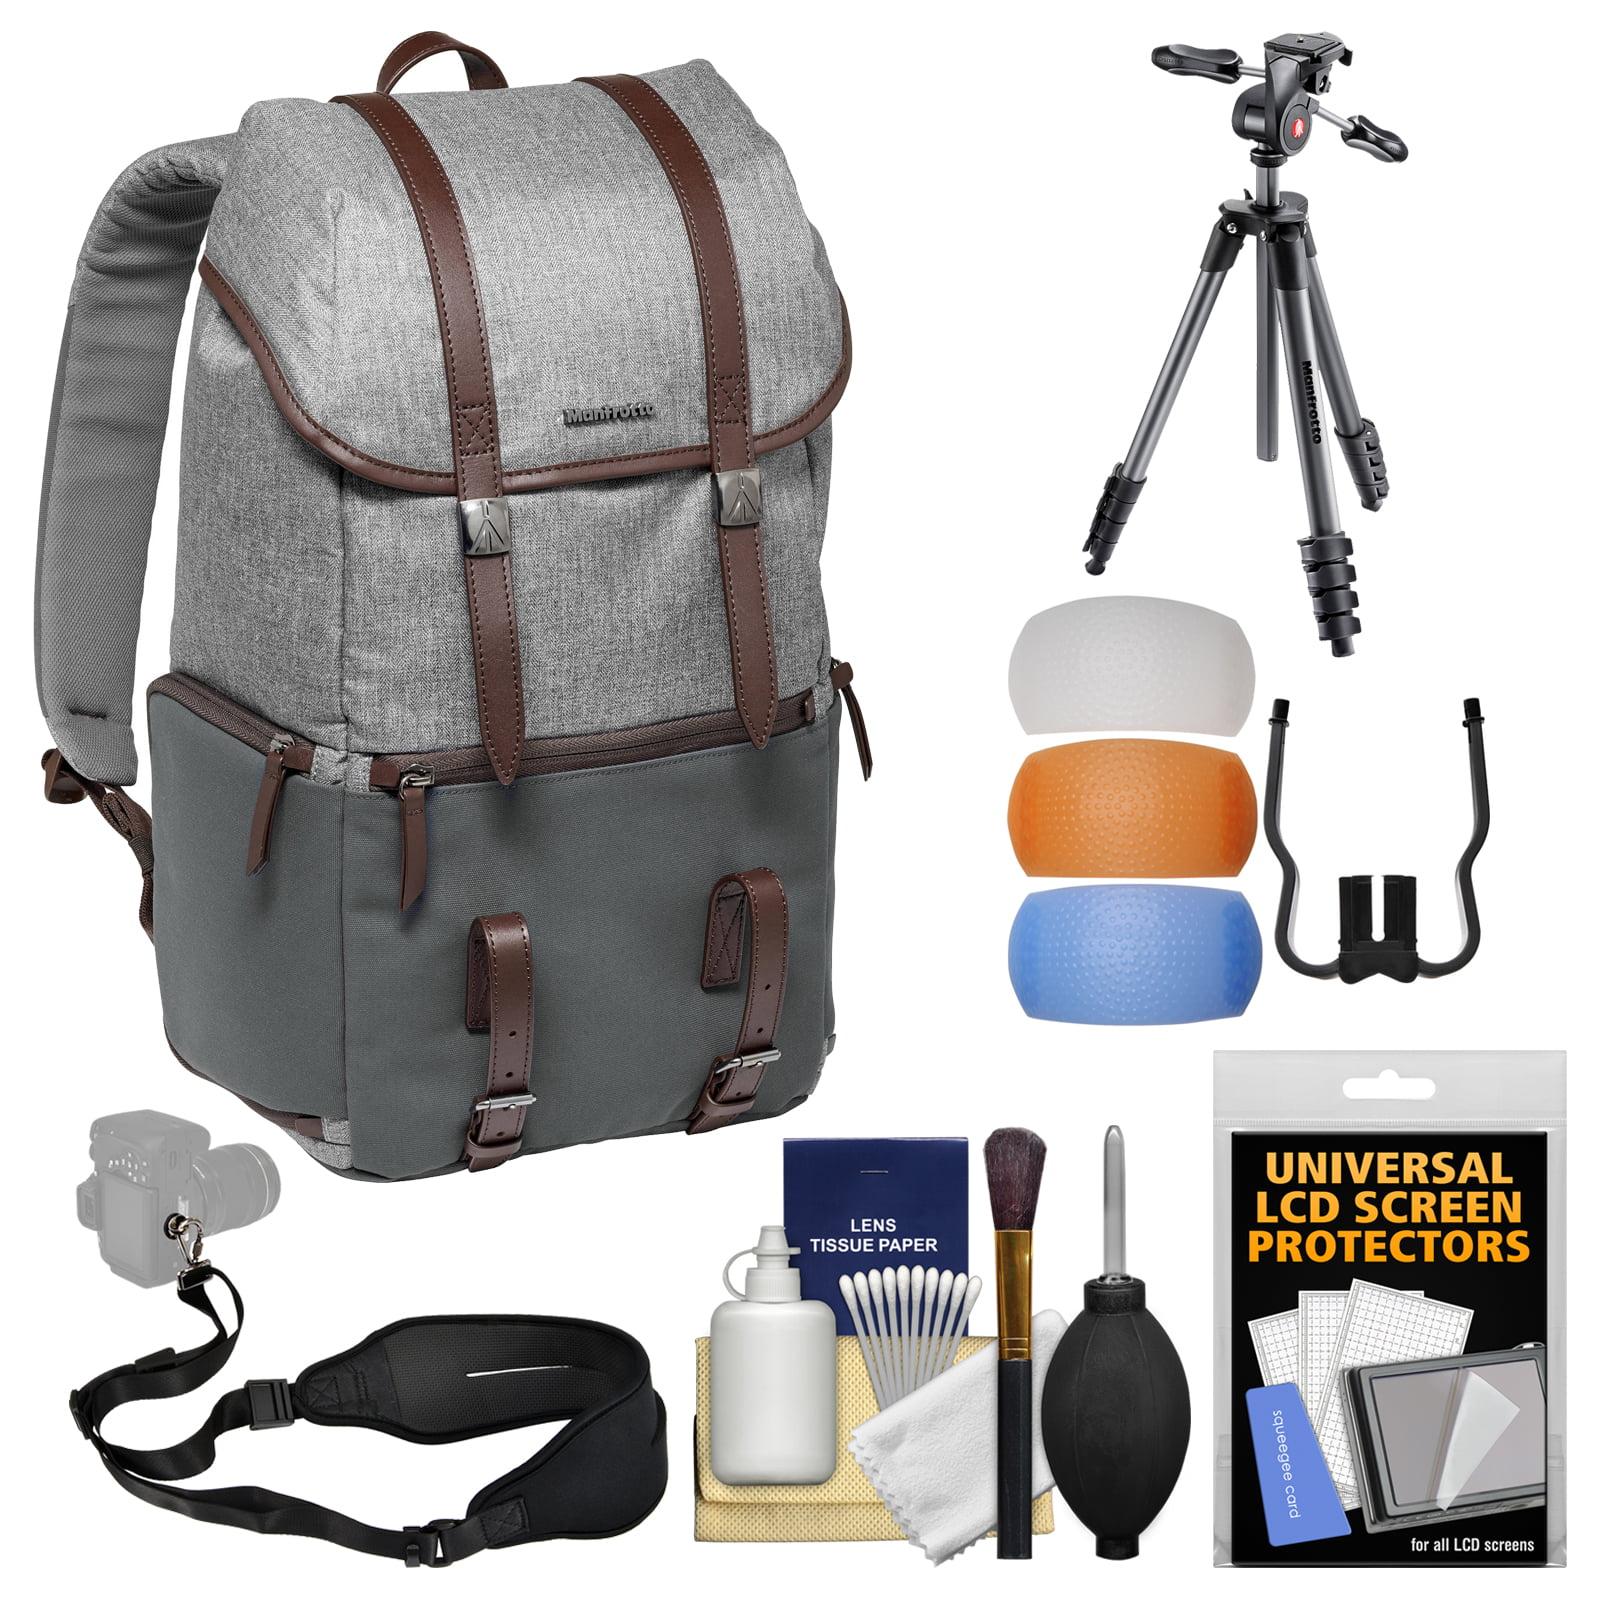 "Manfrotto Lifestyle Windsor Digital SLR Camera Backpack plus 65"" Compact Advanced Aluminum Tripod & Head, Case + Flash Diffuser + Kit"